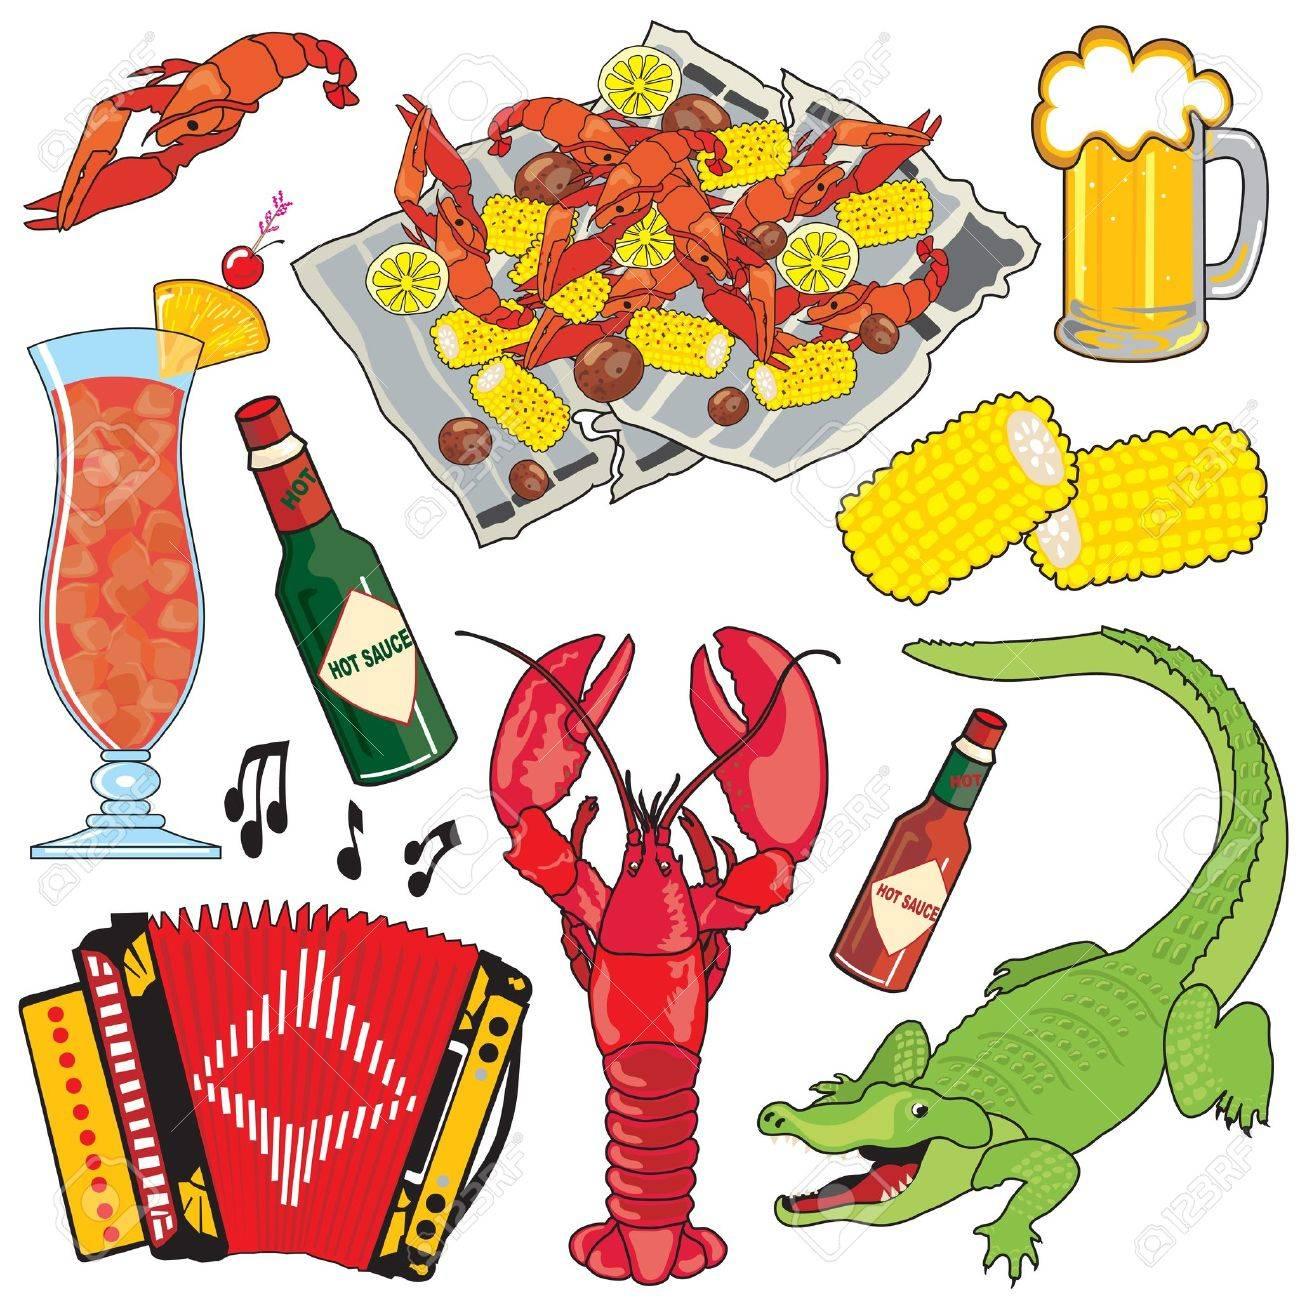 Cajun の食糧音楽および飲み物のクリップアート アイコンおよび要素の